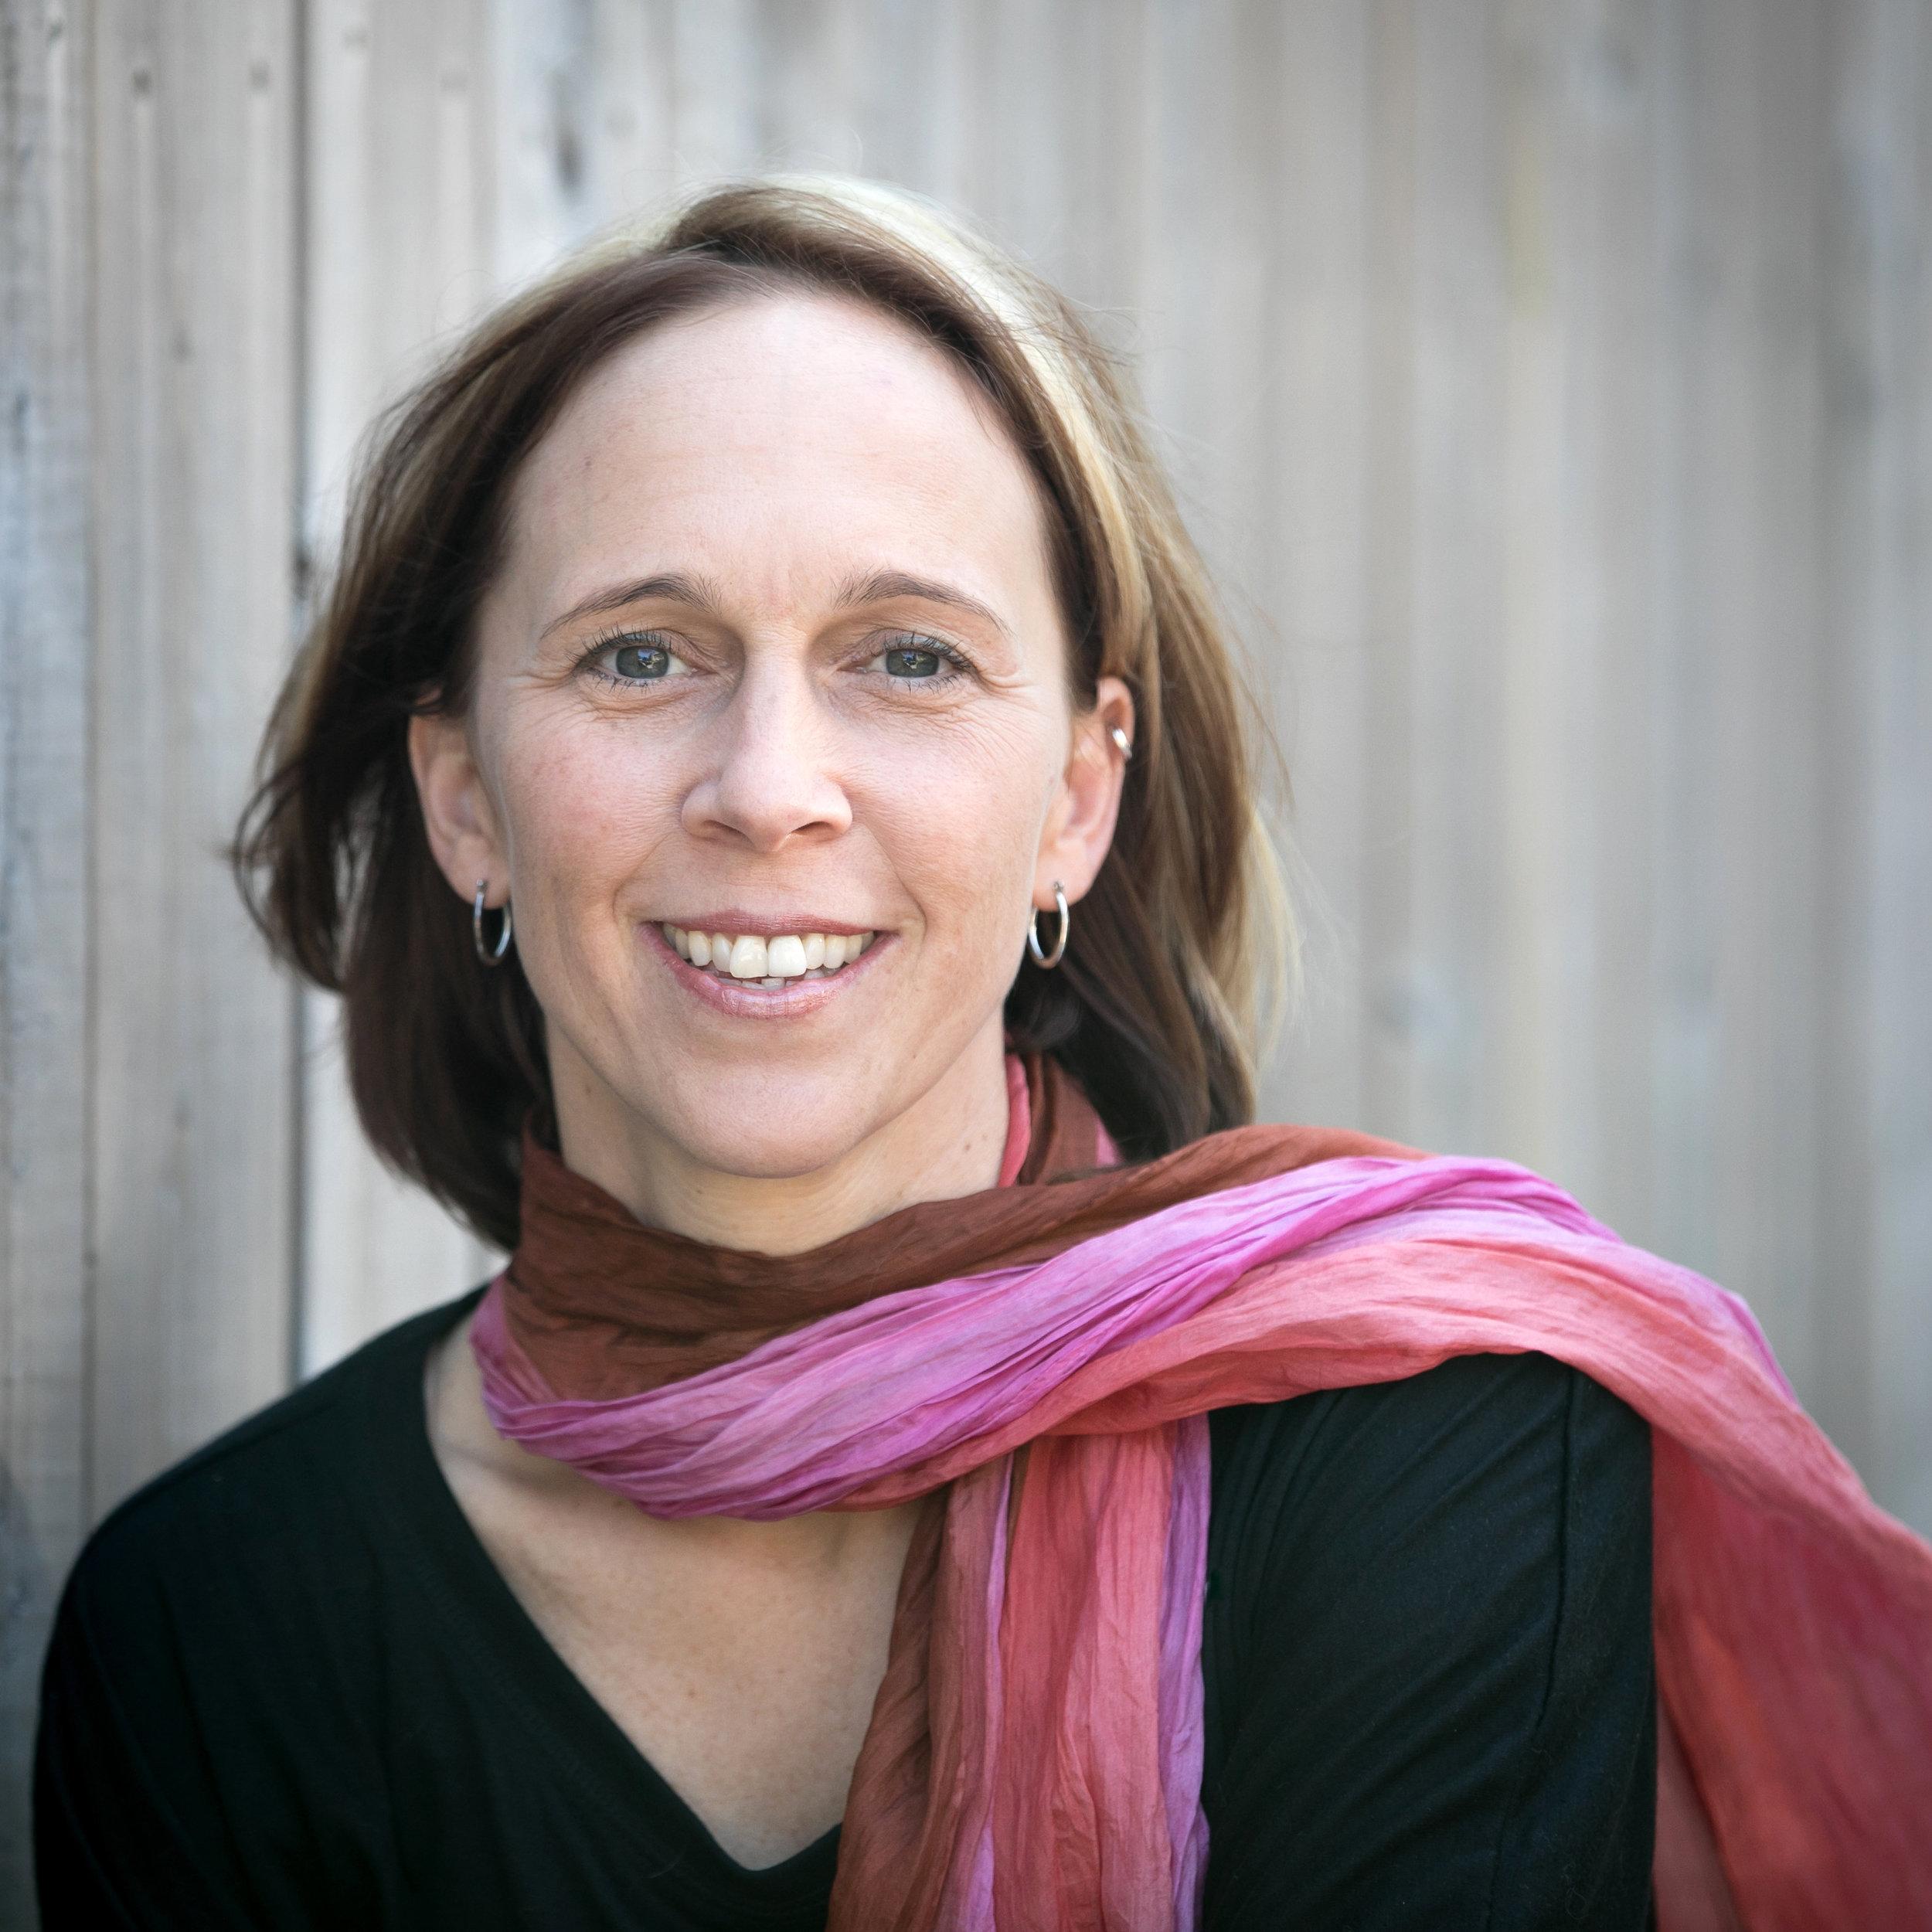 Michelle De Brouwer- Artistic Director